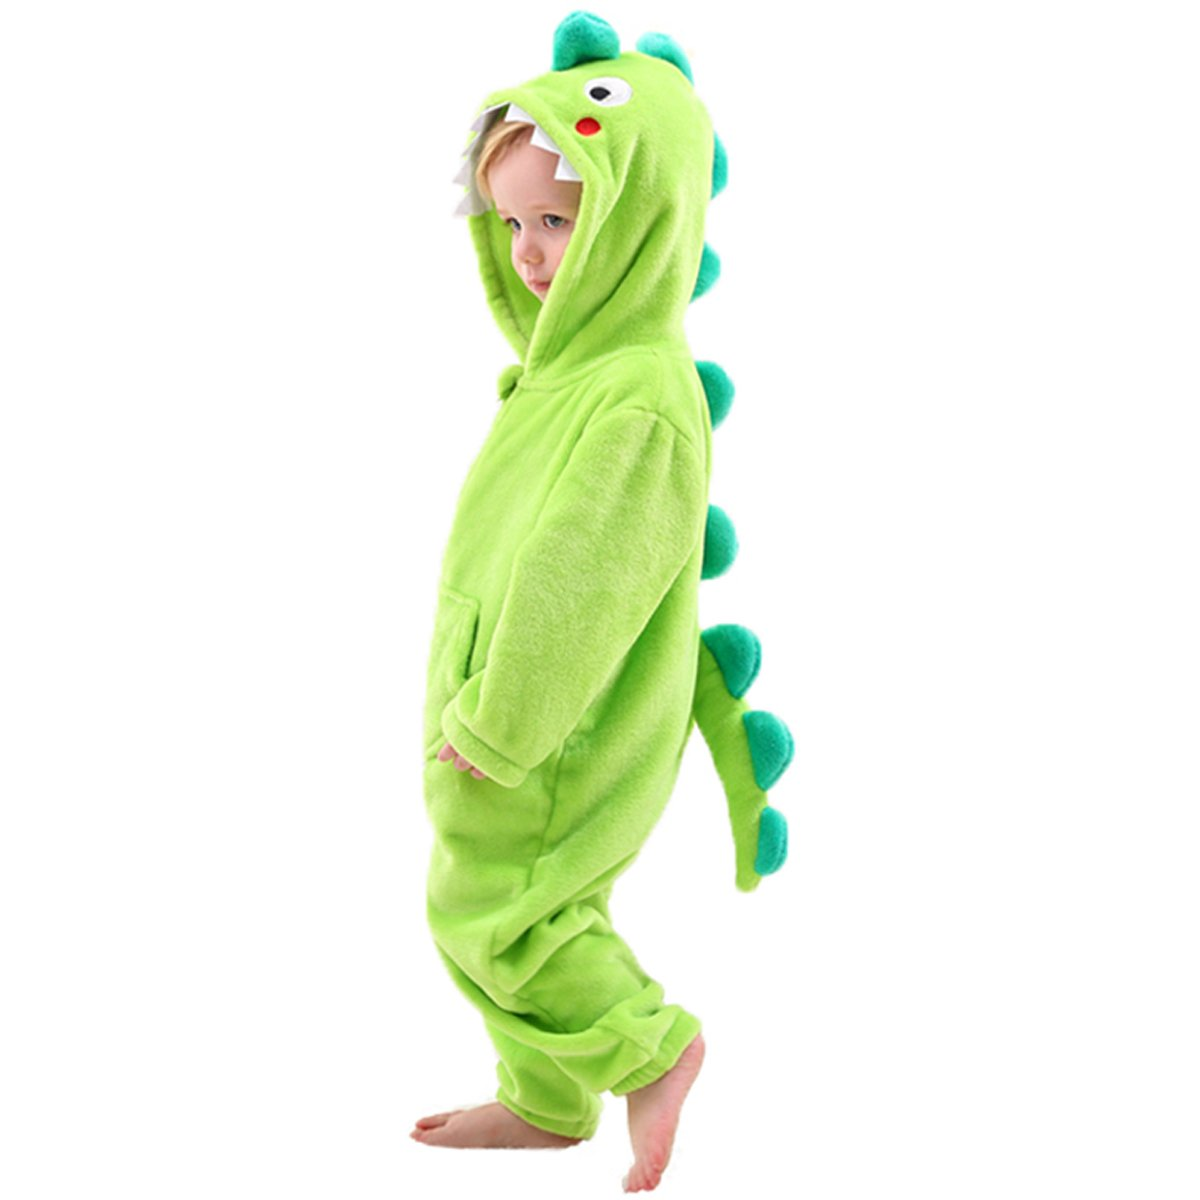 Little Boys Dinosaur Dragon Costume Onesie -Kids Fleece Pajama Green